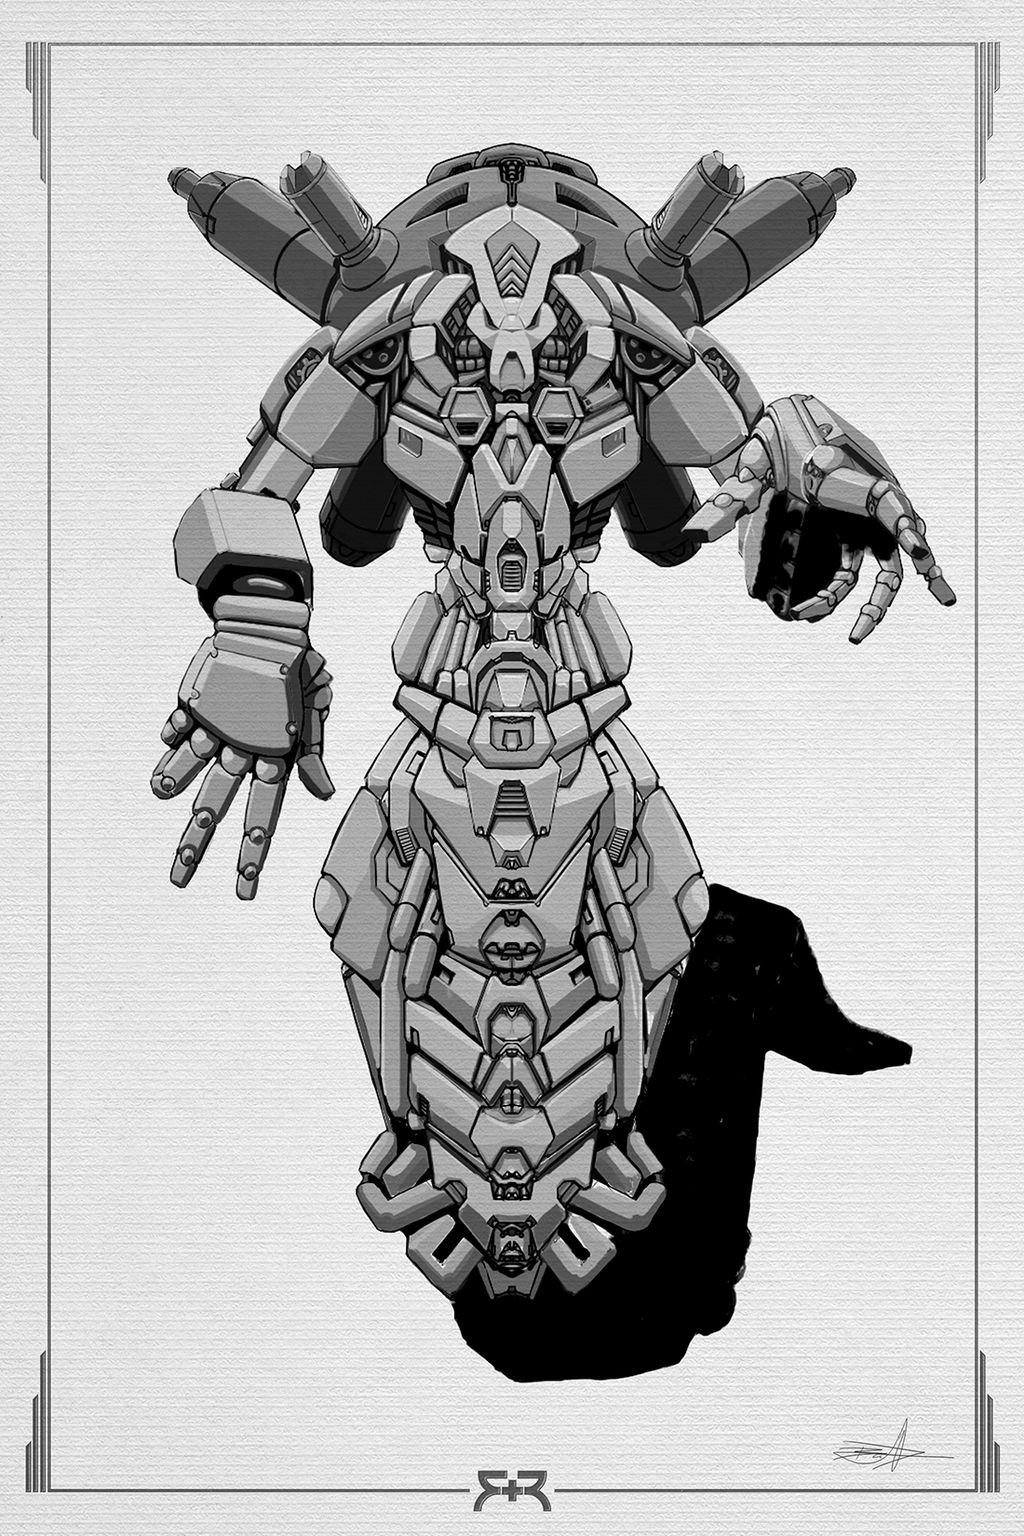 DOODLES - Robots 02 by VR-Robotica